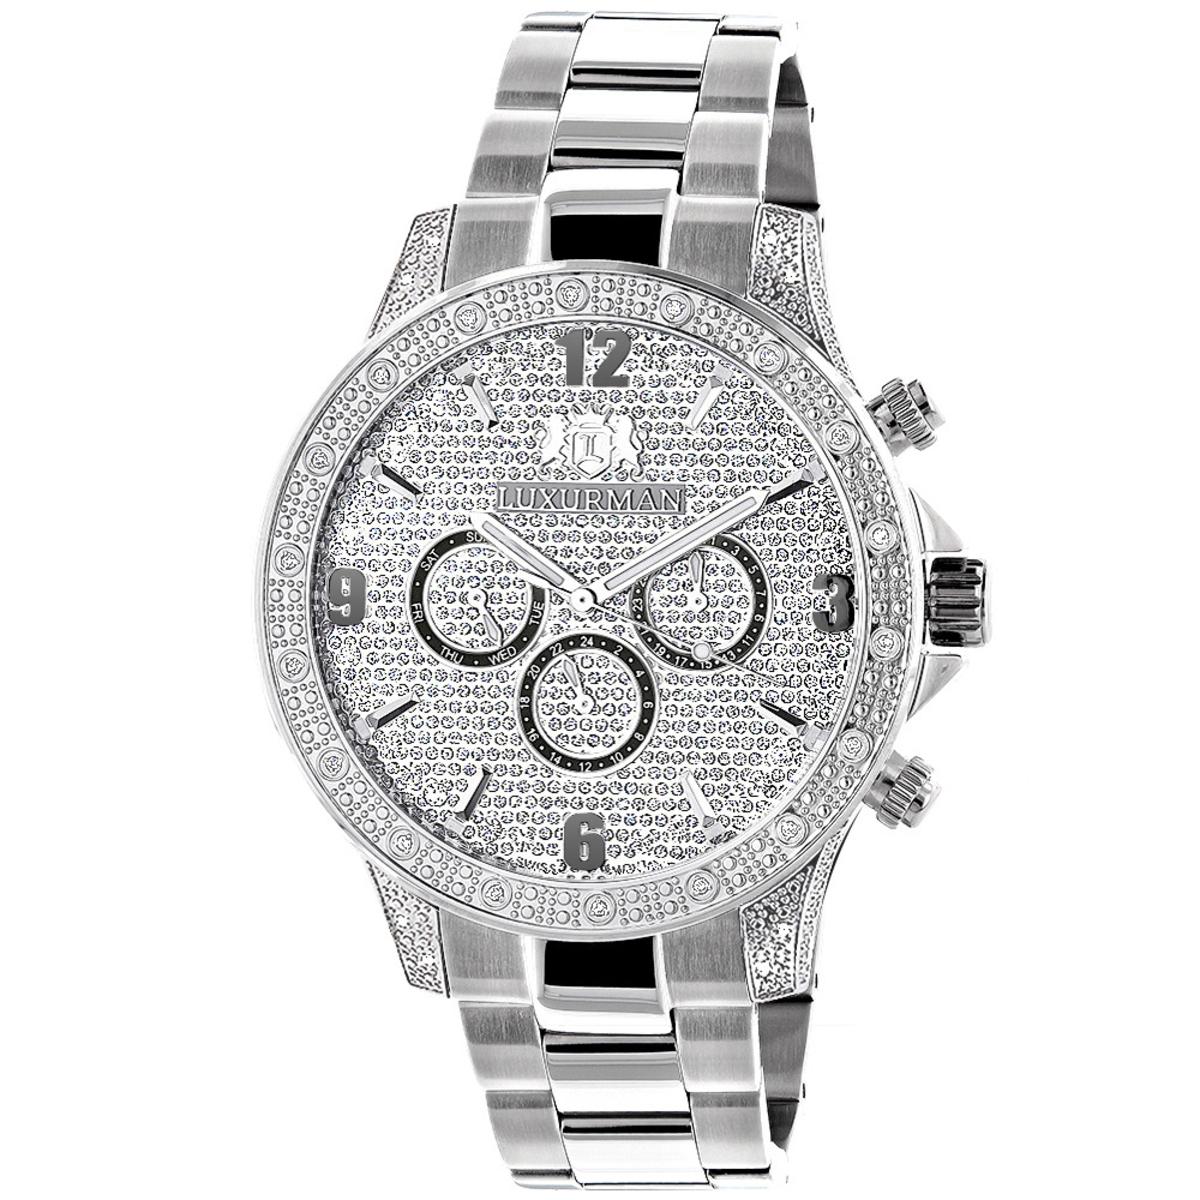 Celebrity Diamond Watch for Men by Luxurman 0.5ct Liberty